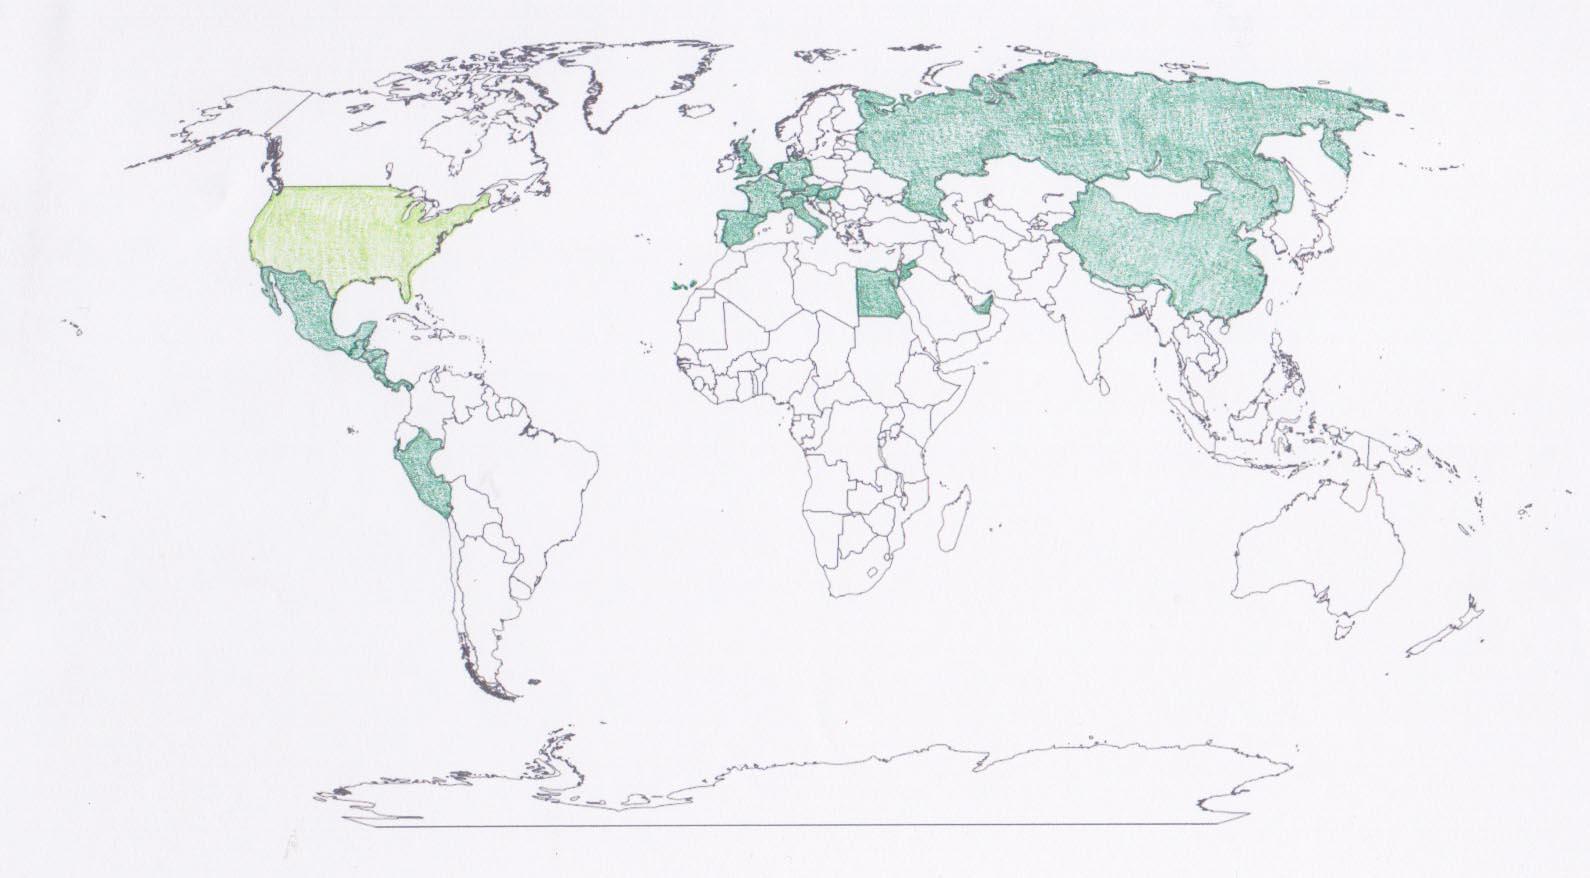 worldmap 4.jpeg